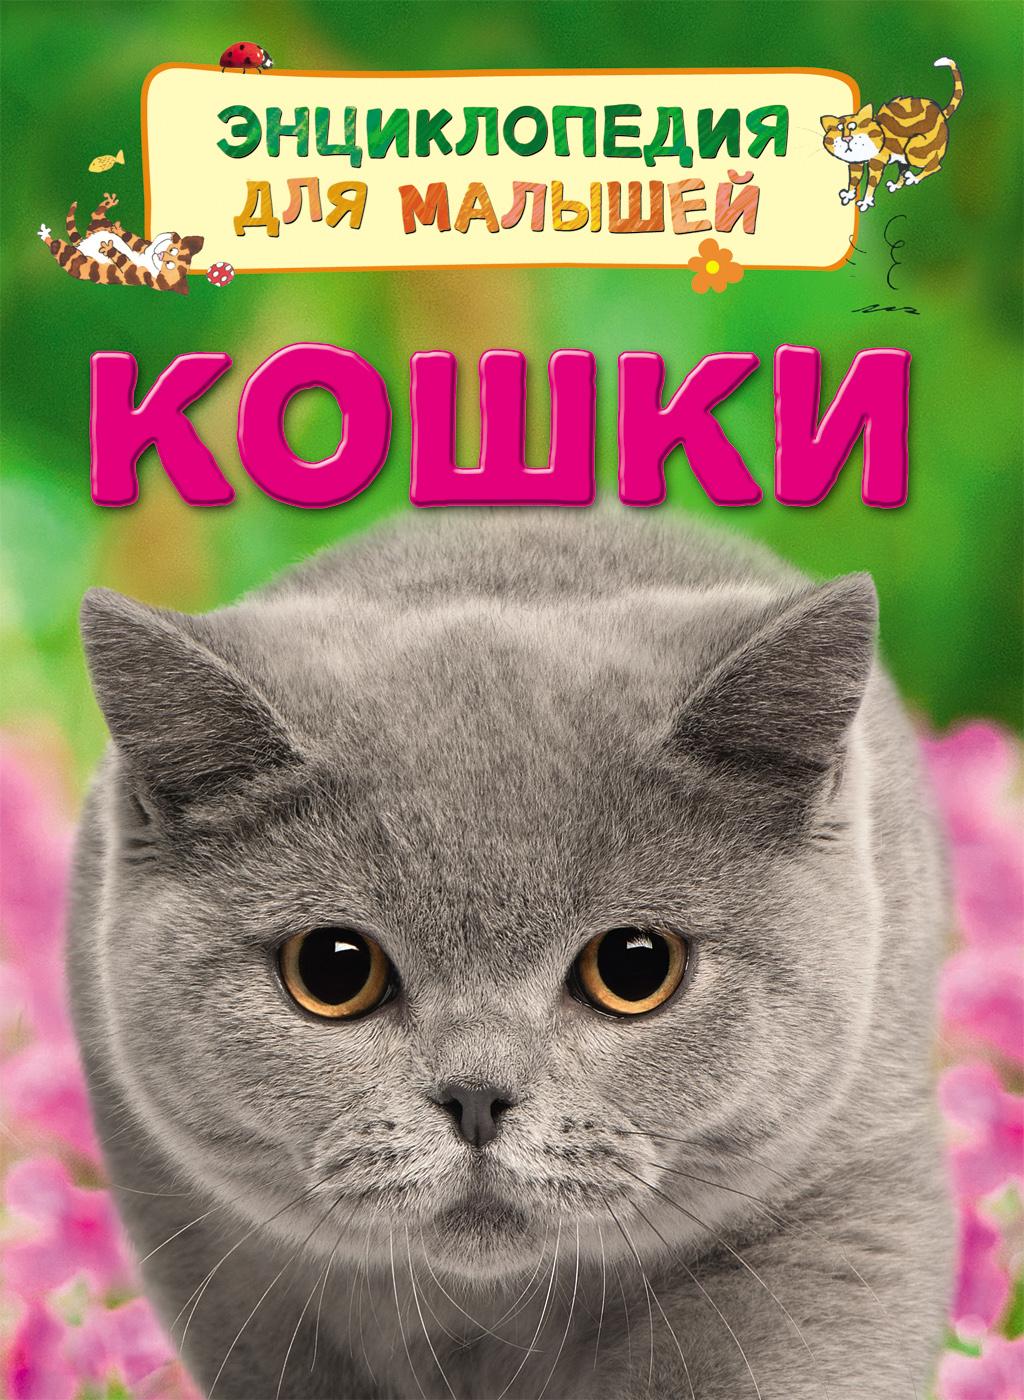 Кошки для кошки